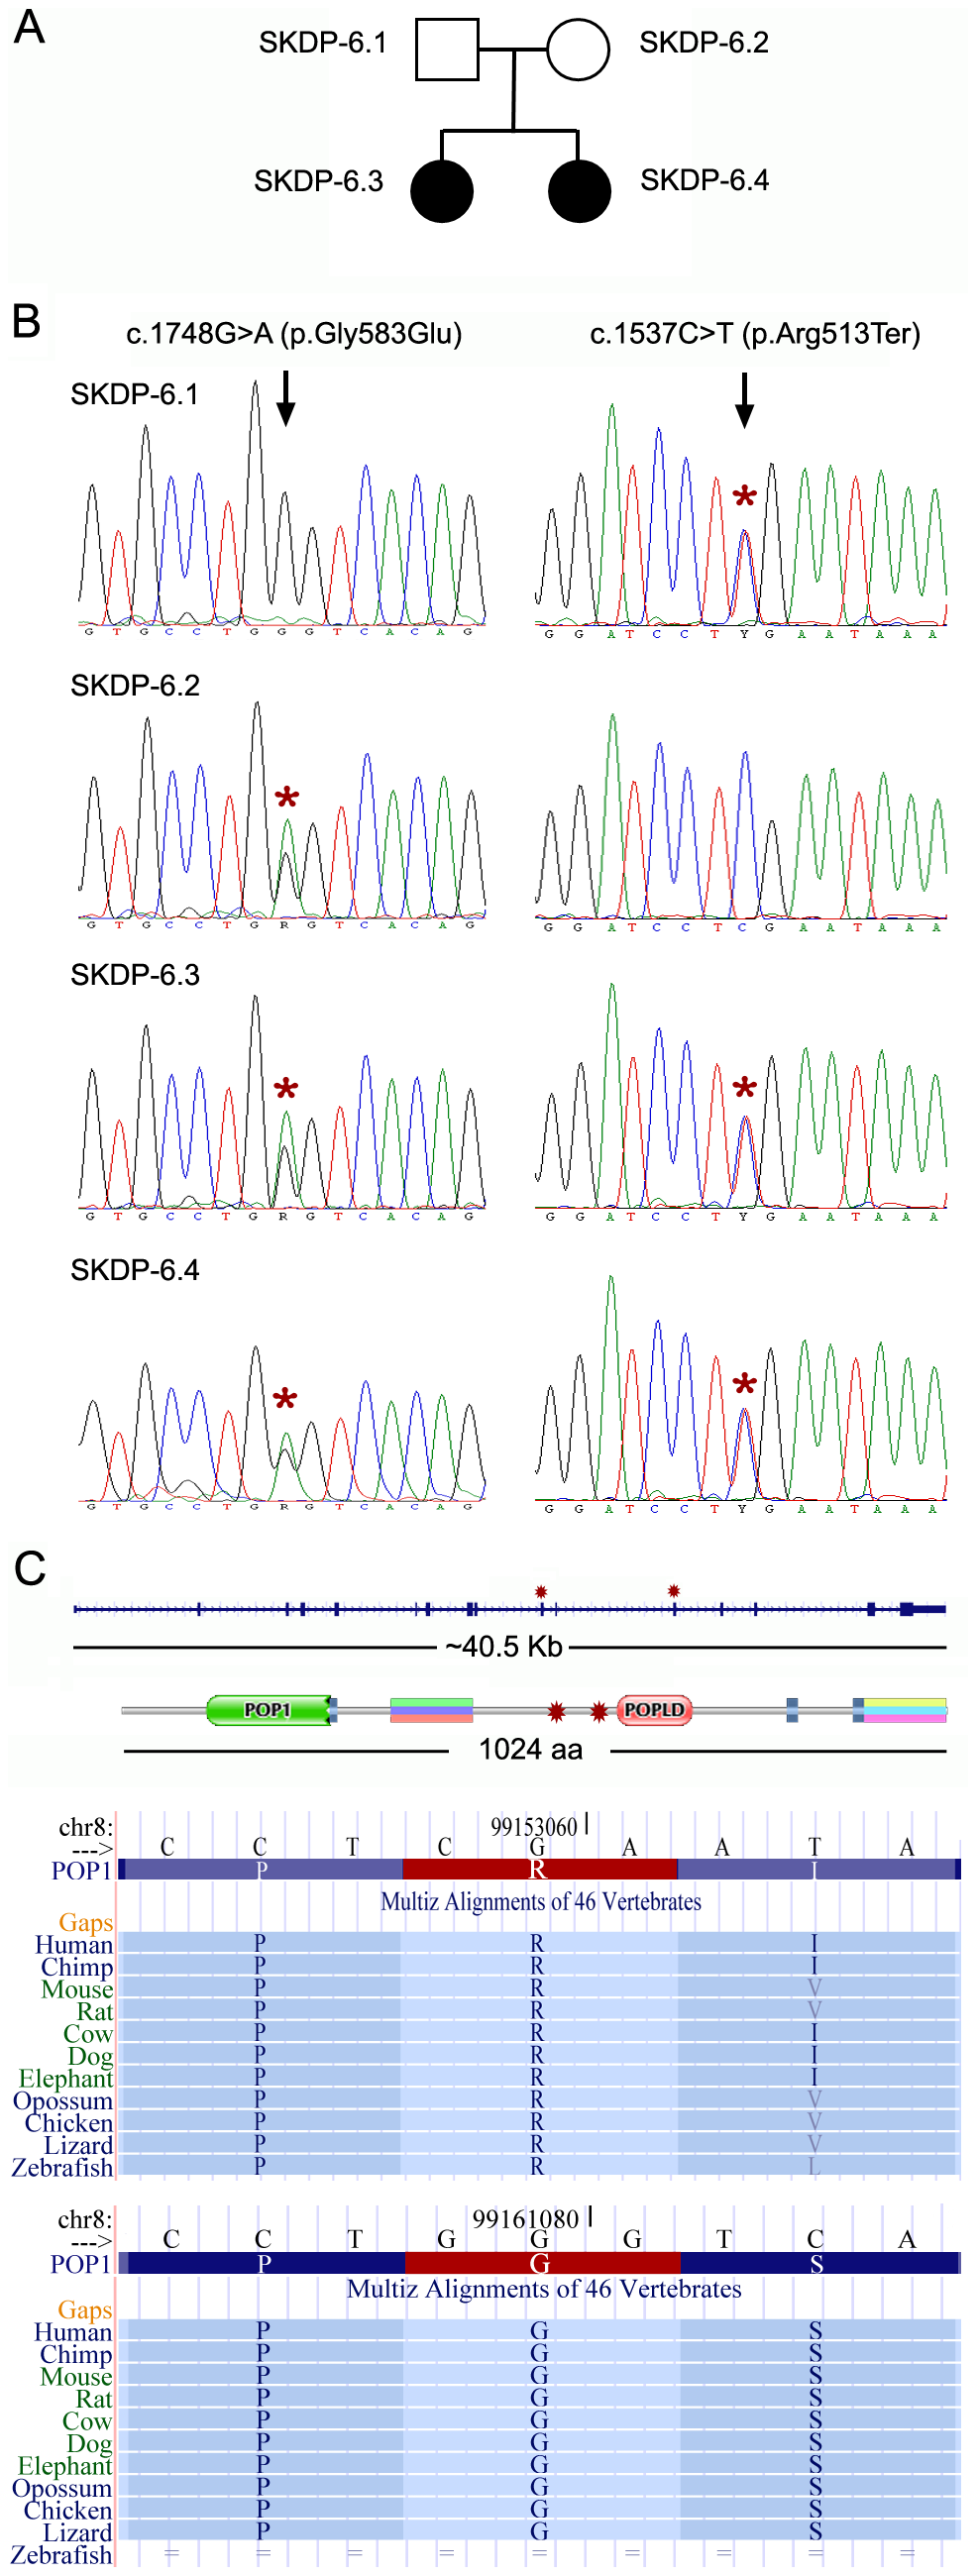 Mutations in the <i>POP1</i> gene.